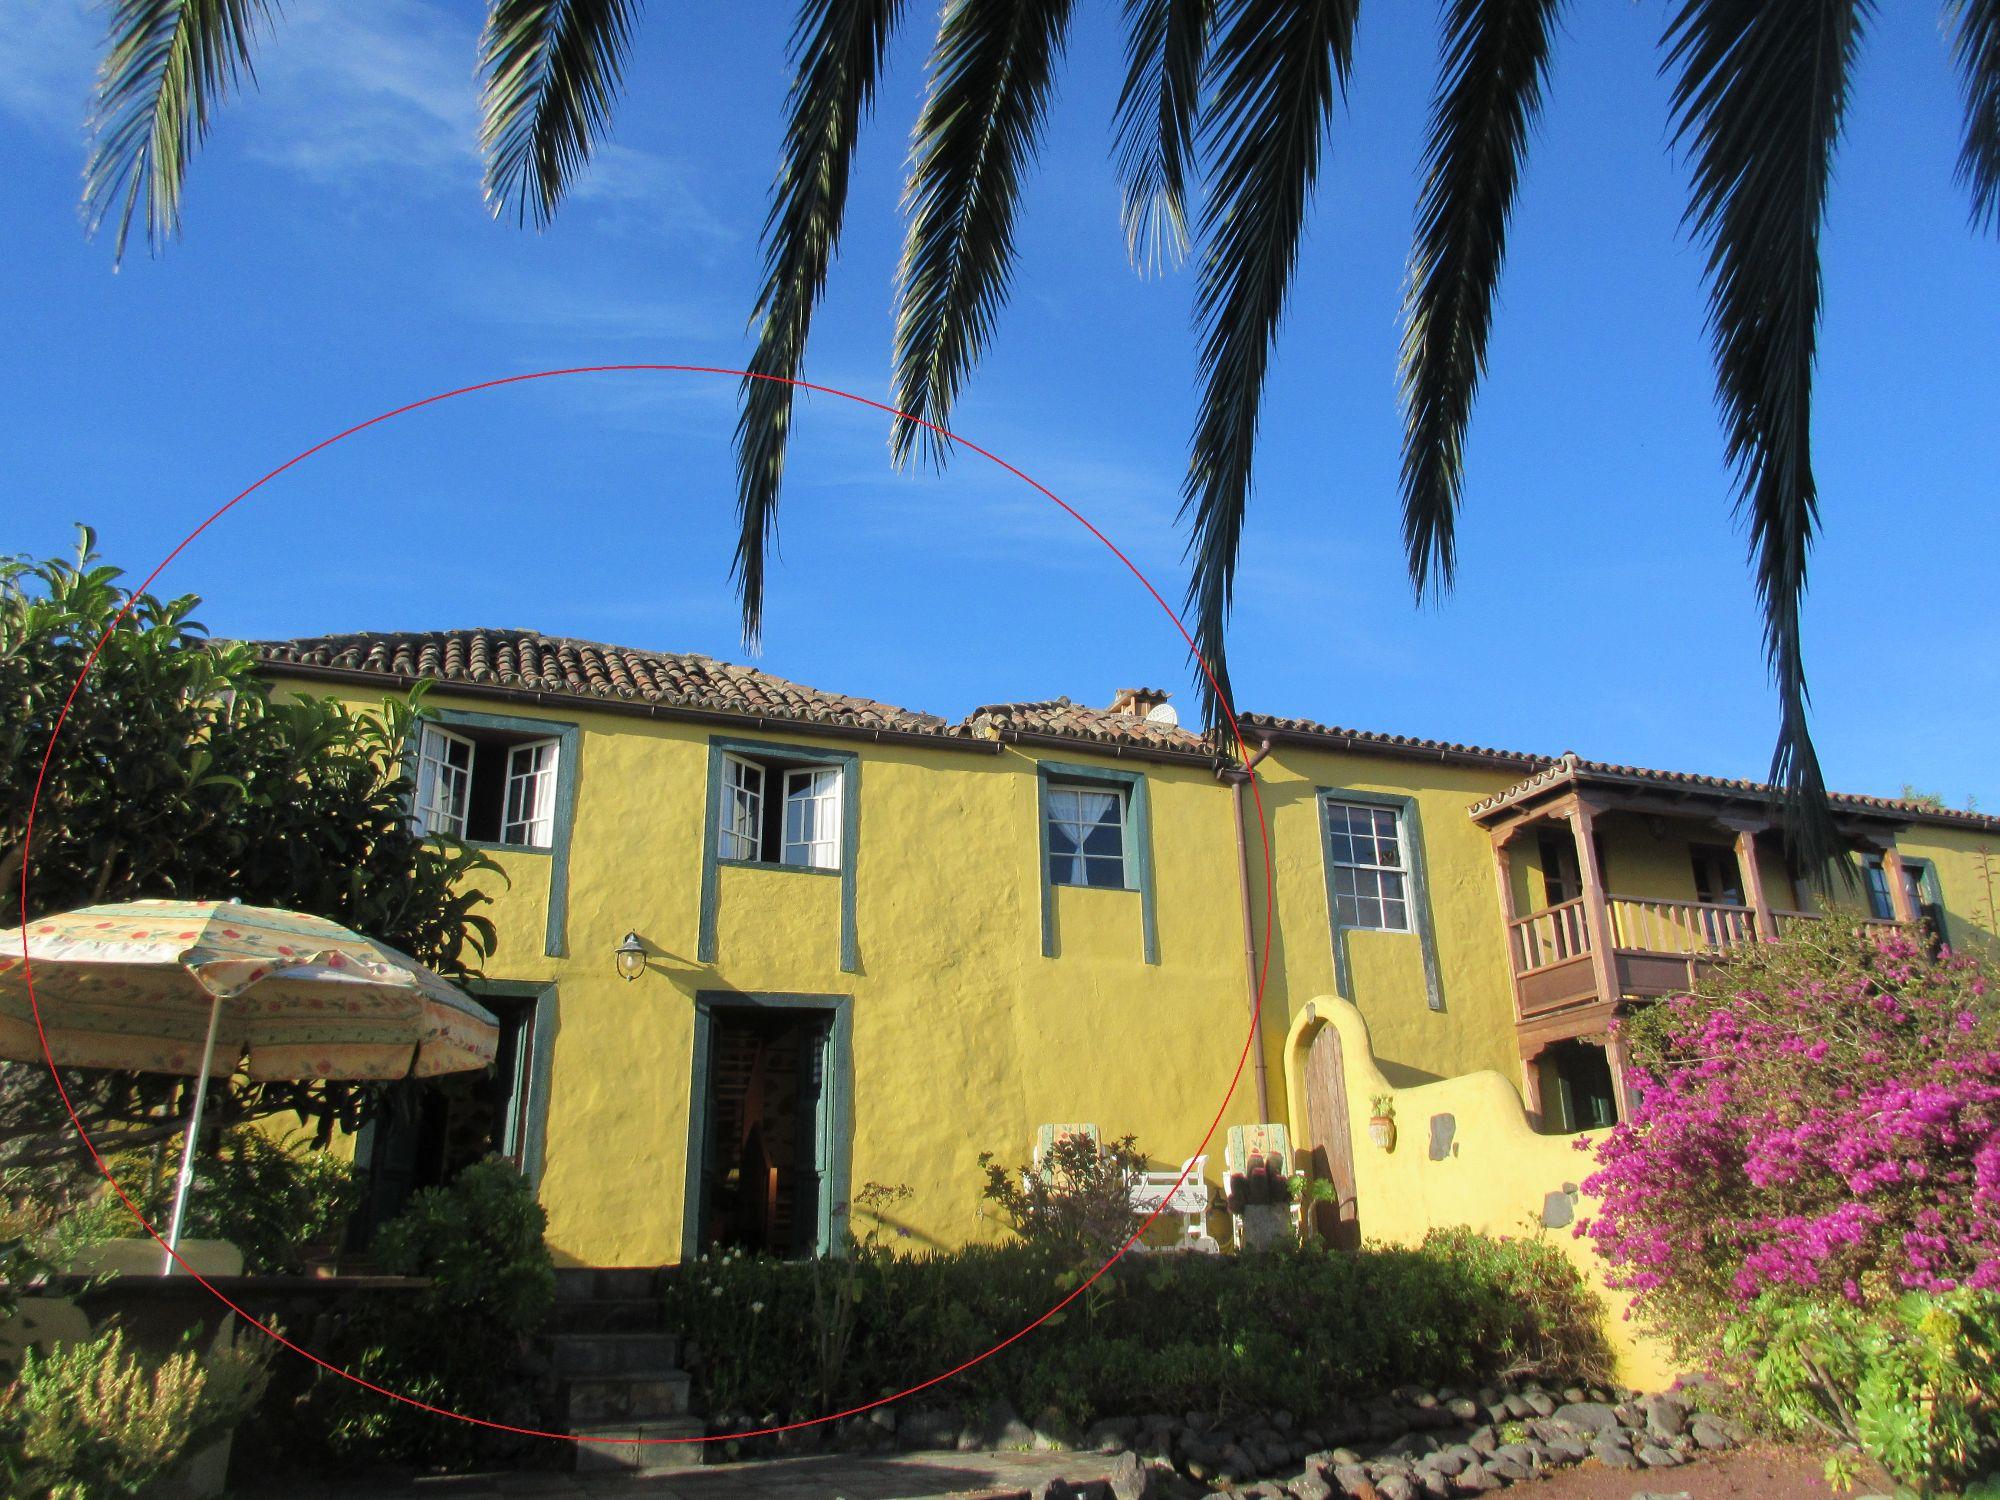 Casa Gloria with adjoining farmhouse